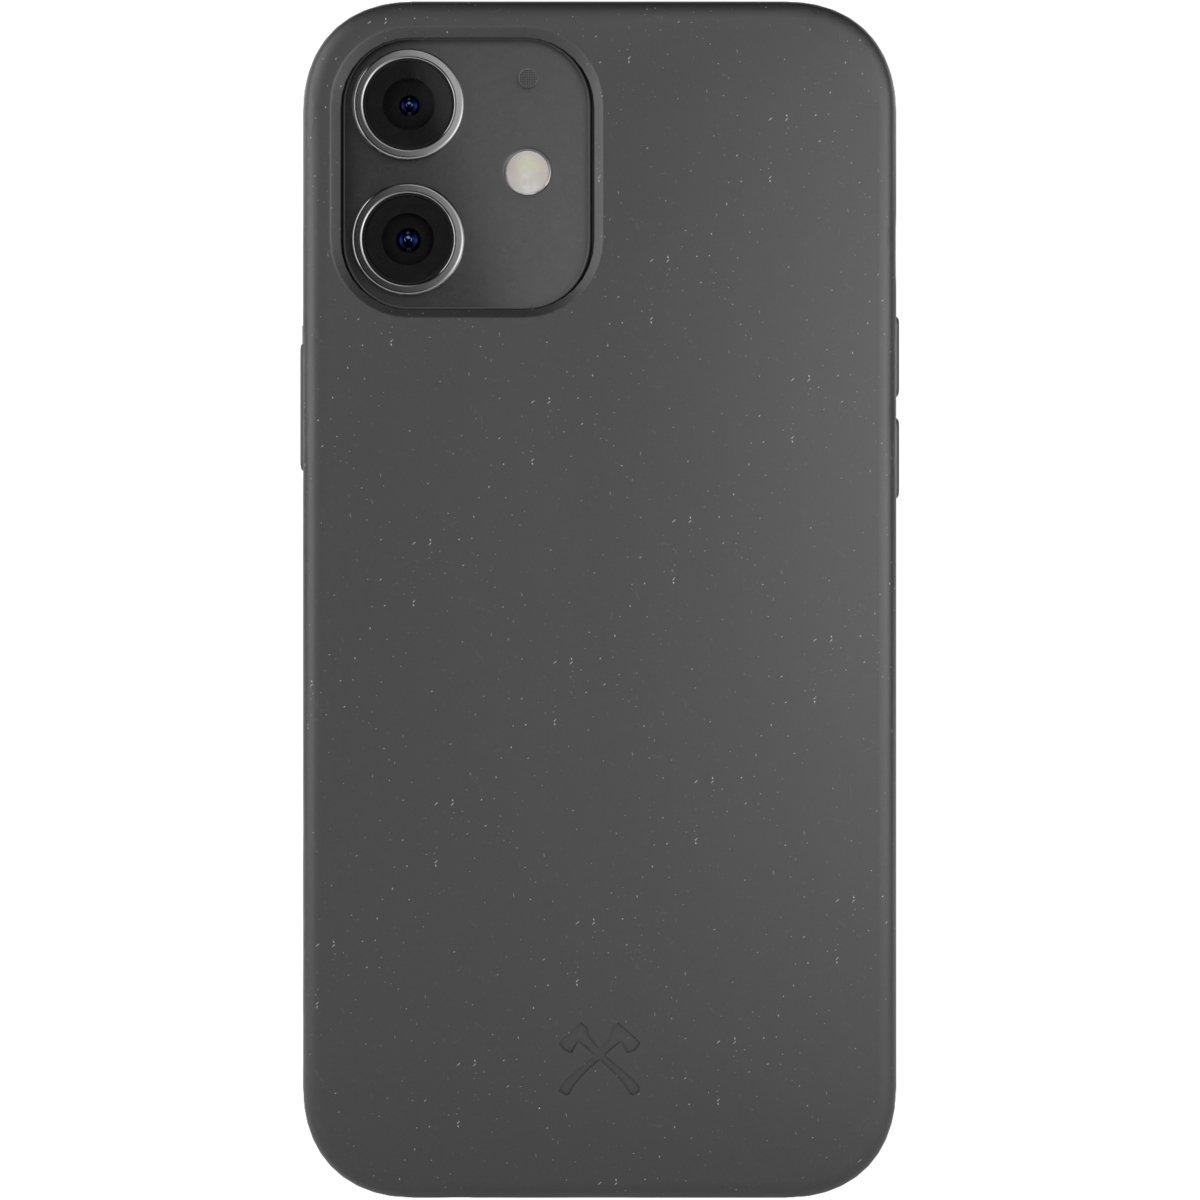 Woodcessories Bio Case AM iPhone 12 Mini - black